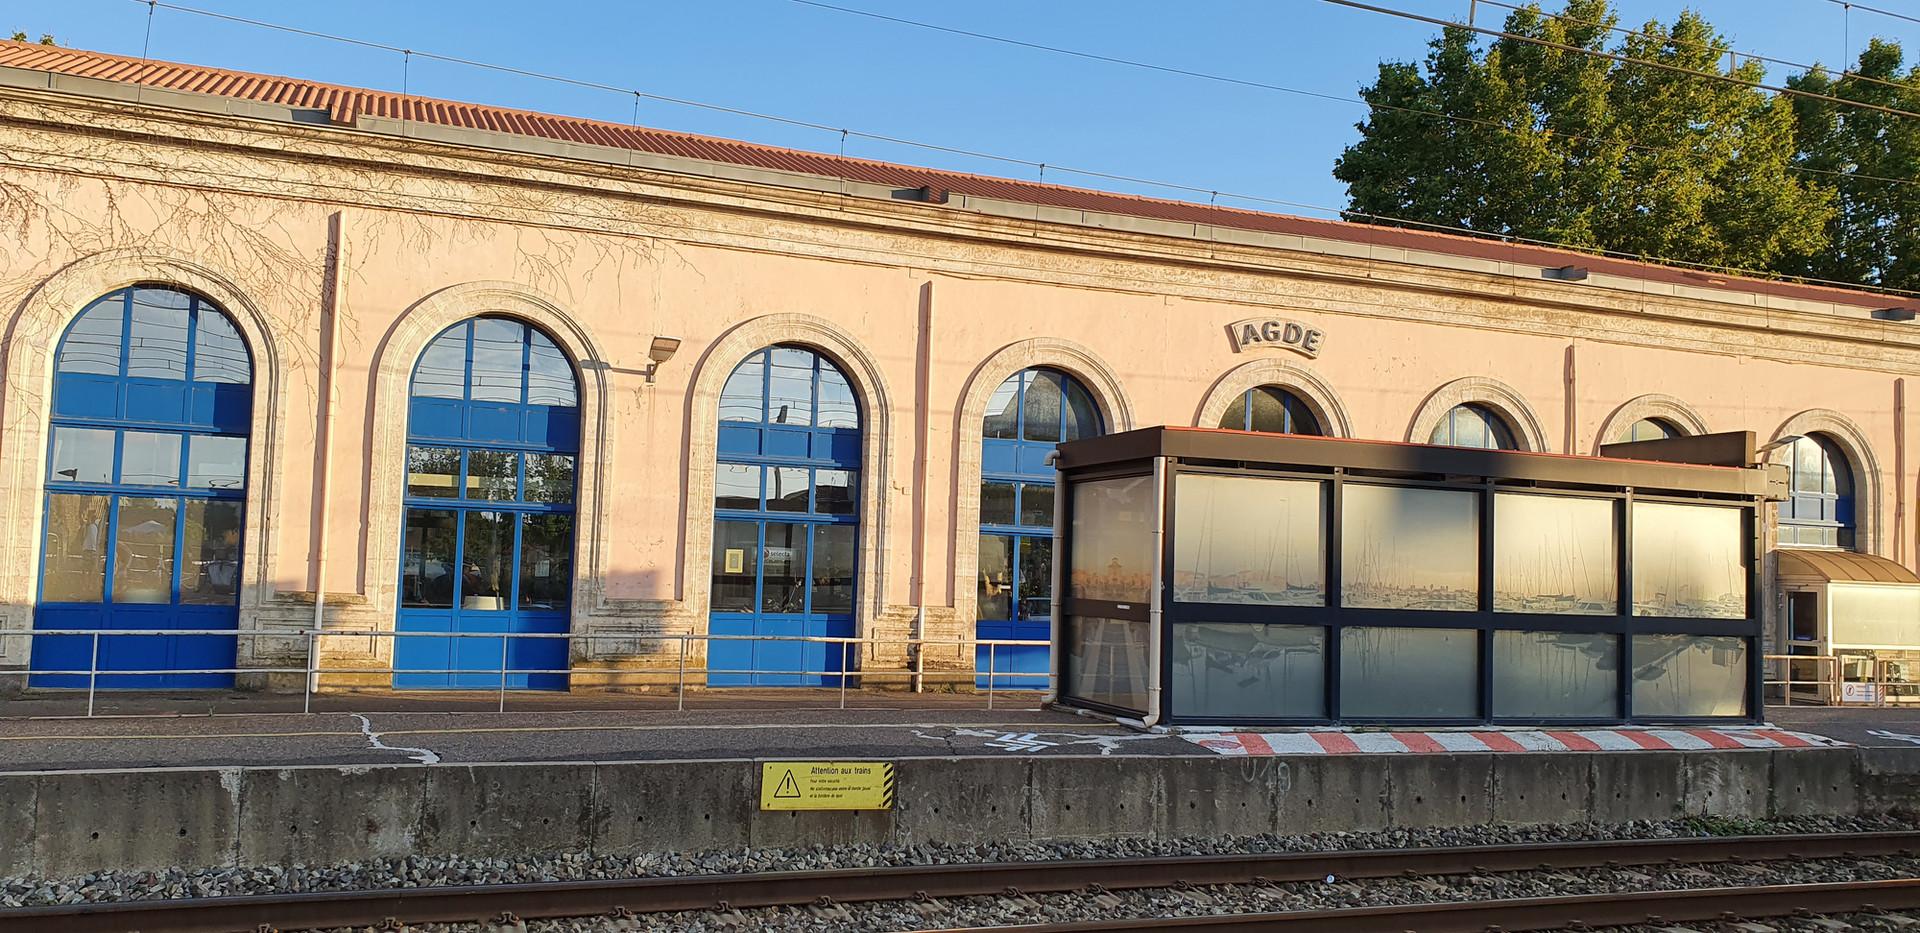 Train Station!